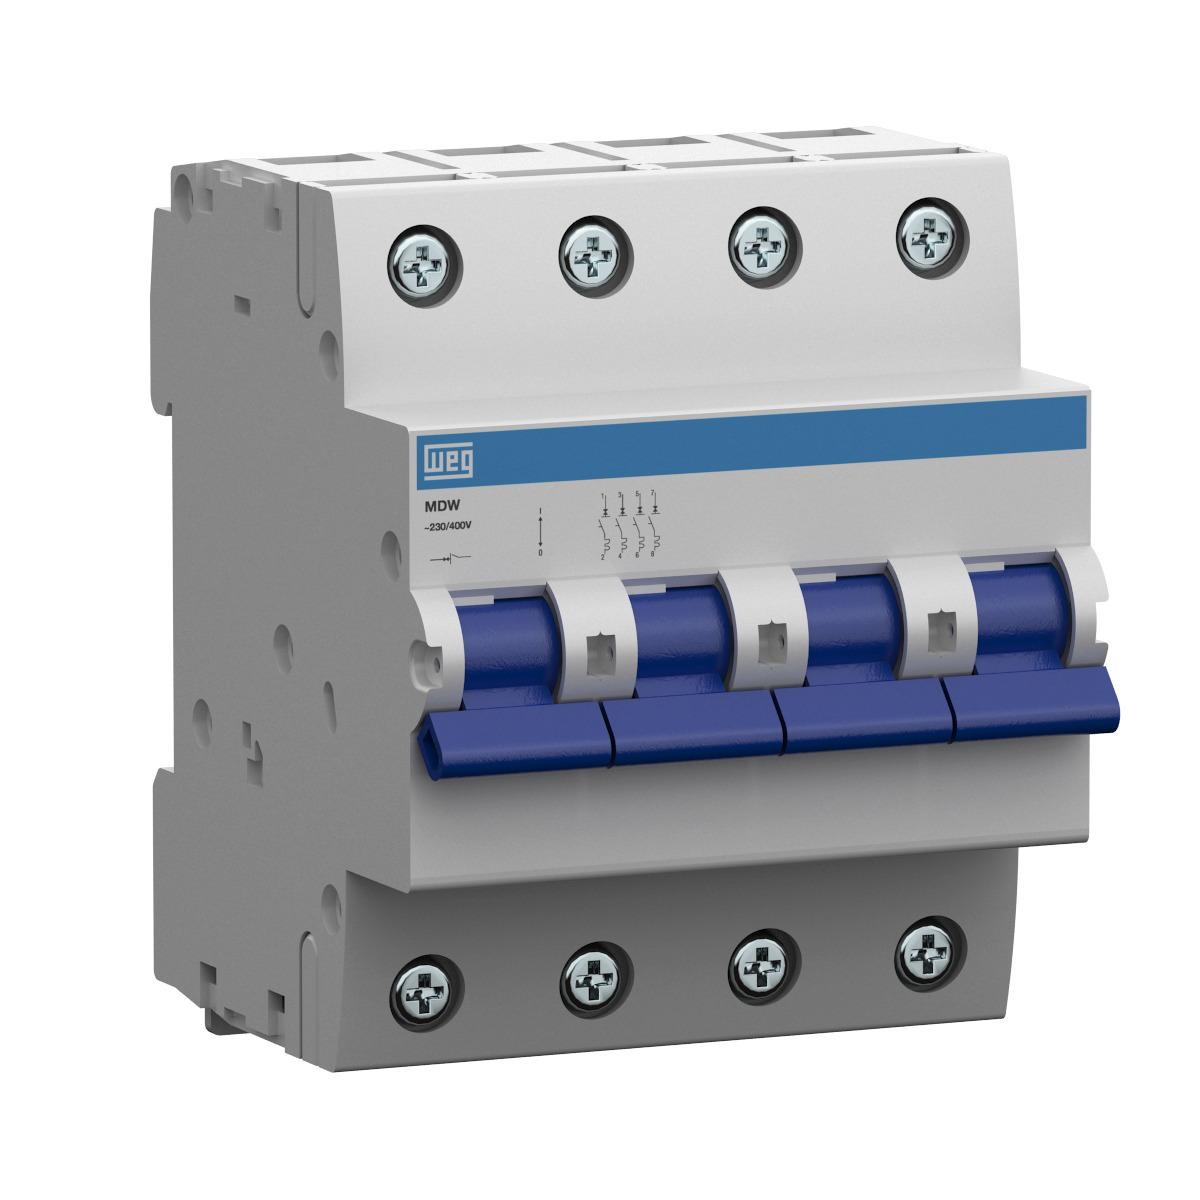 Minidisjuntor Termomagnético WEG MDW-C50-4 (entrega em 5 dias)